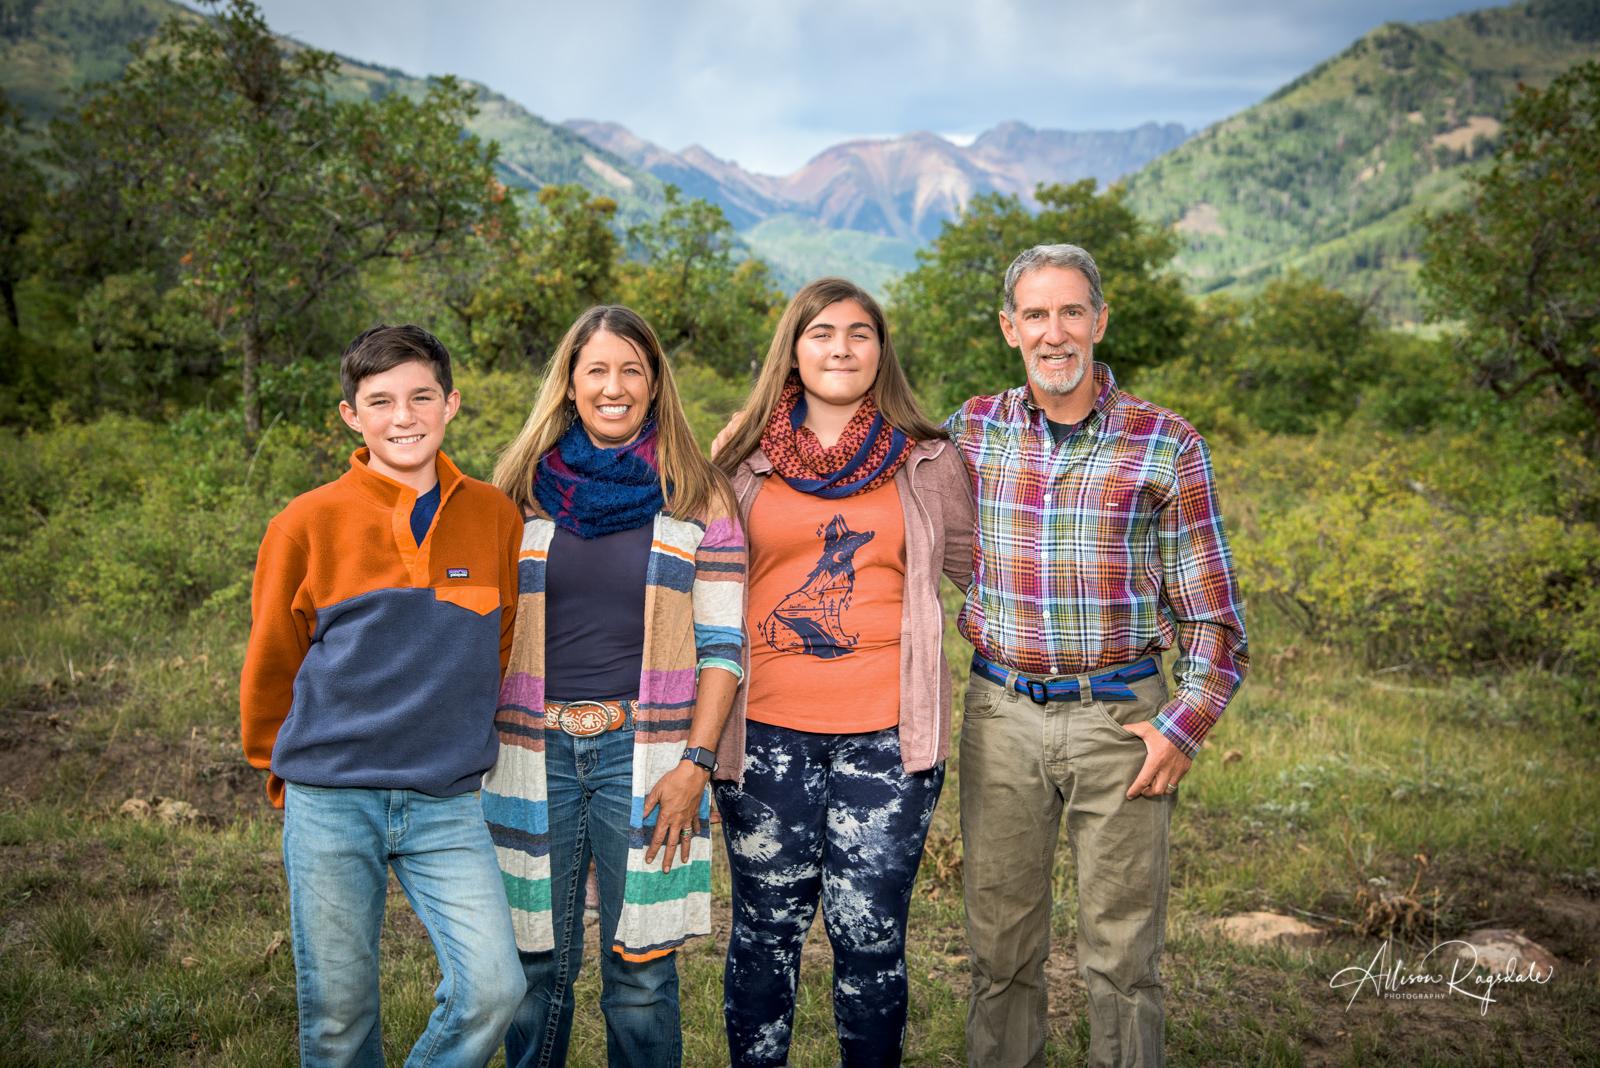 Allison Ragsdale Photography family portraits in Durango Colorado